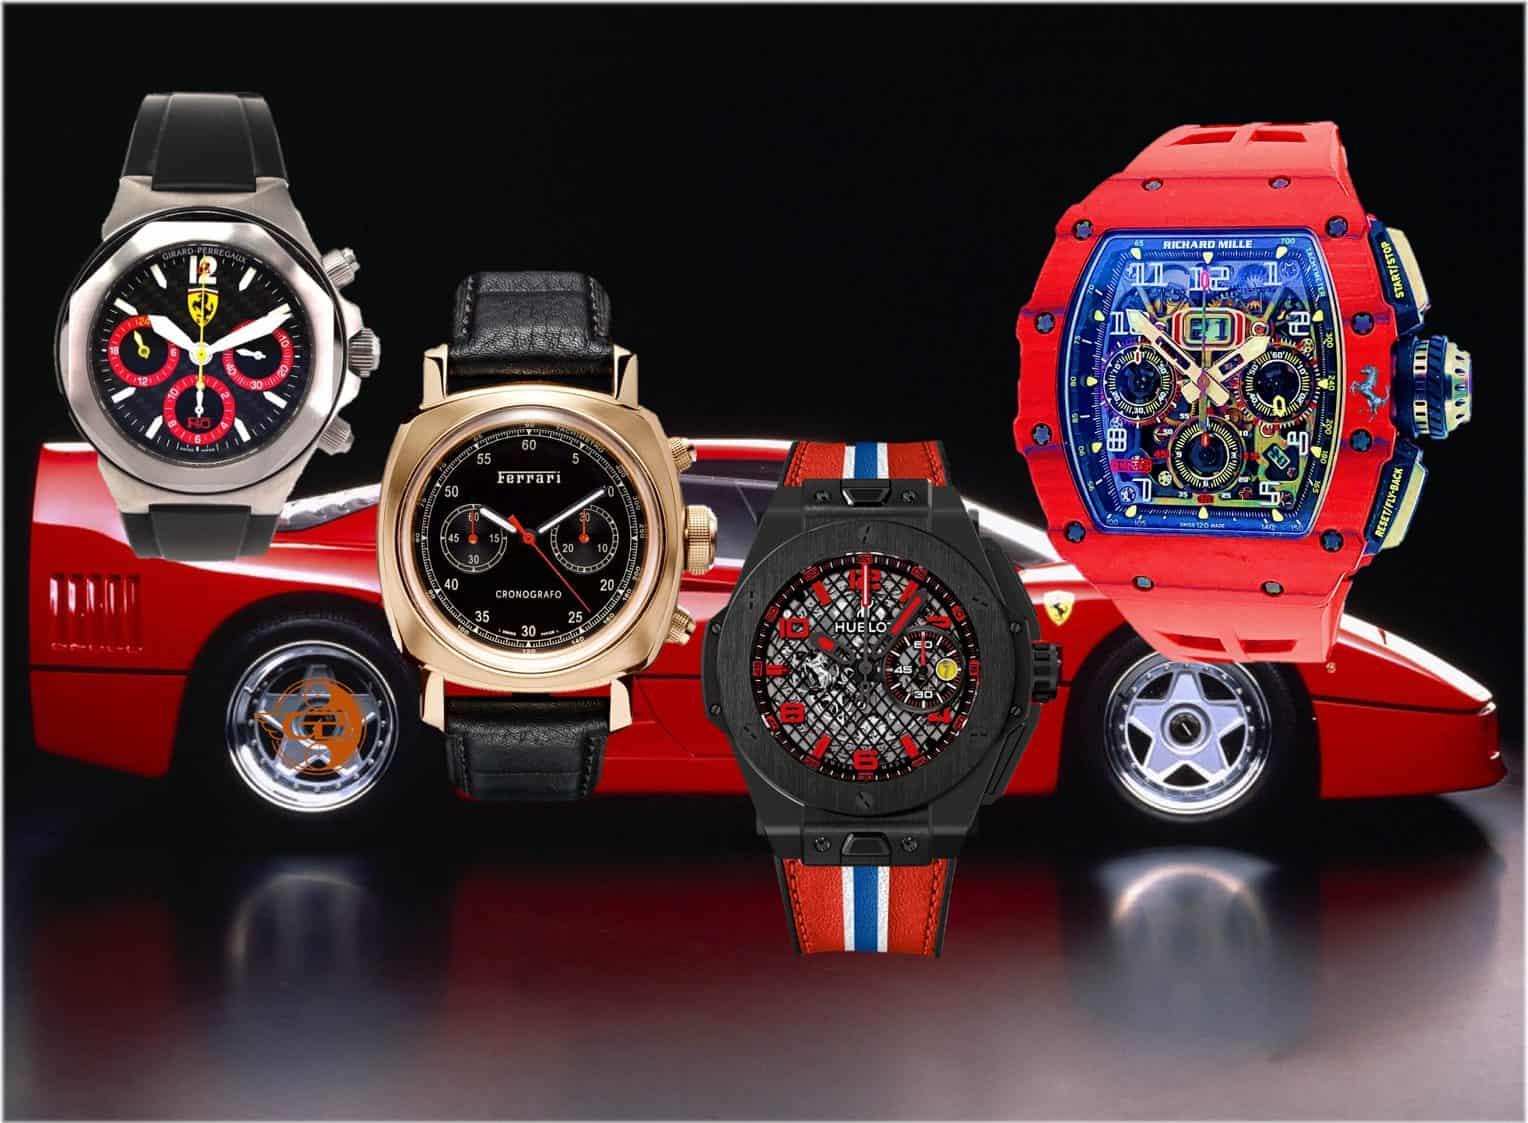 Kooperation Richard Mille FerrariFerrari und seine Uhren Partner: Girard-Perregaux, Panerai, Hublot und nun Richard Mille